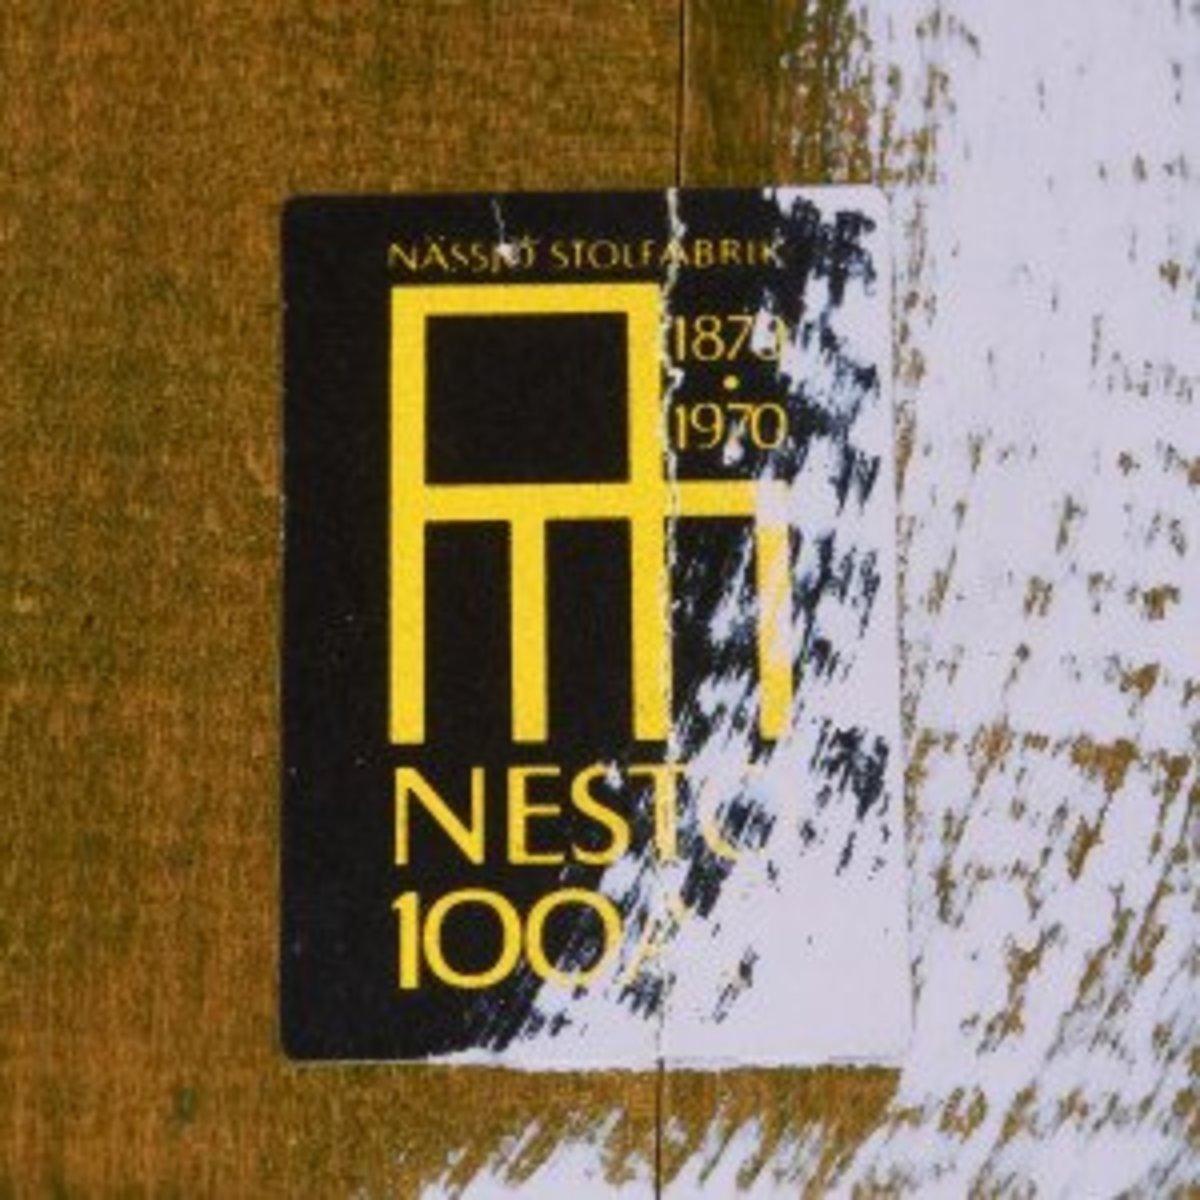 IZ46039F○スウェーデン Nassjo Stolefabrik チェア 北欧 ヴィンテージ ウィンザー アームチェア Lena Larsson ペイント 椅子 イス Nesto_画像9